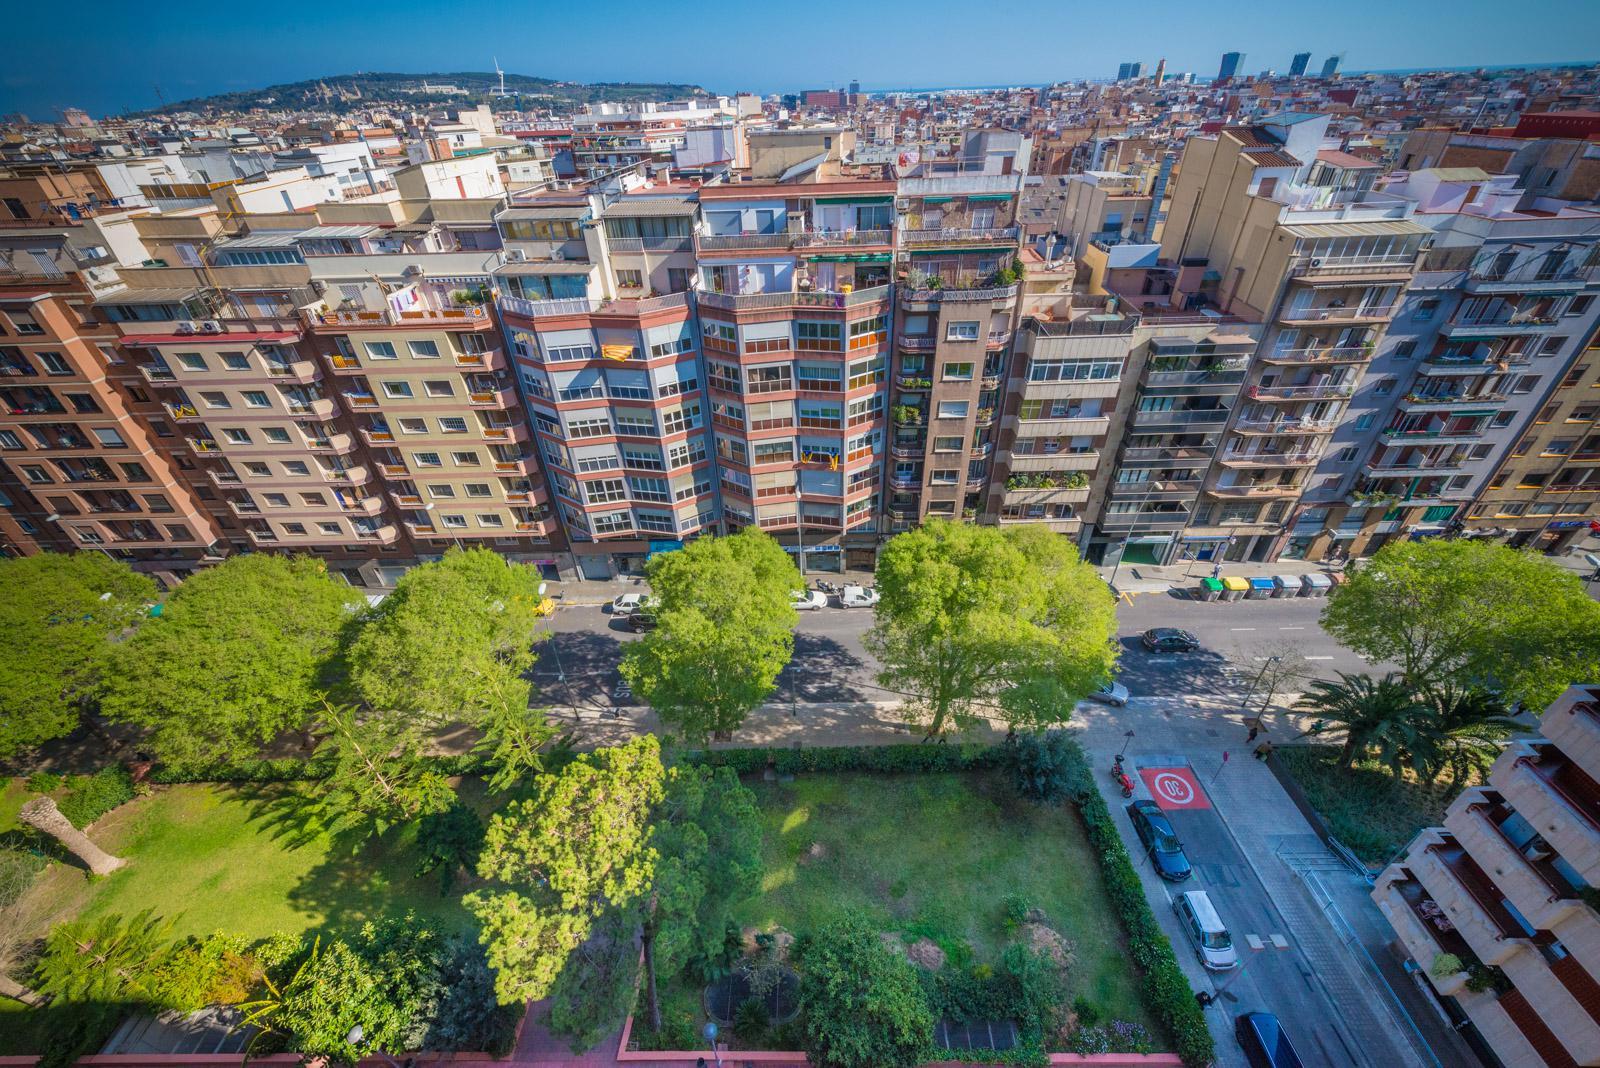 152882 - Trav, Corts - Camp Nou